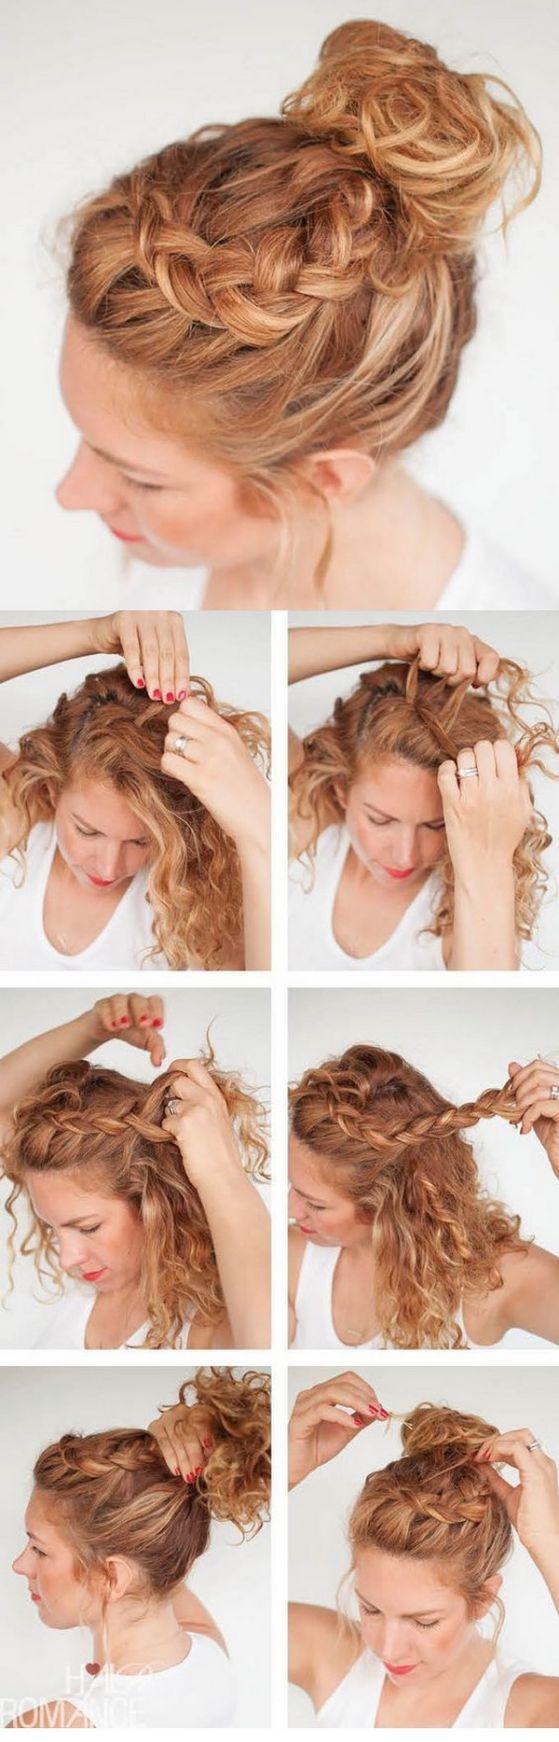 peinados fÁciles y rápidos paso a paso modelos hair style